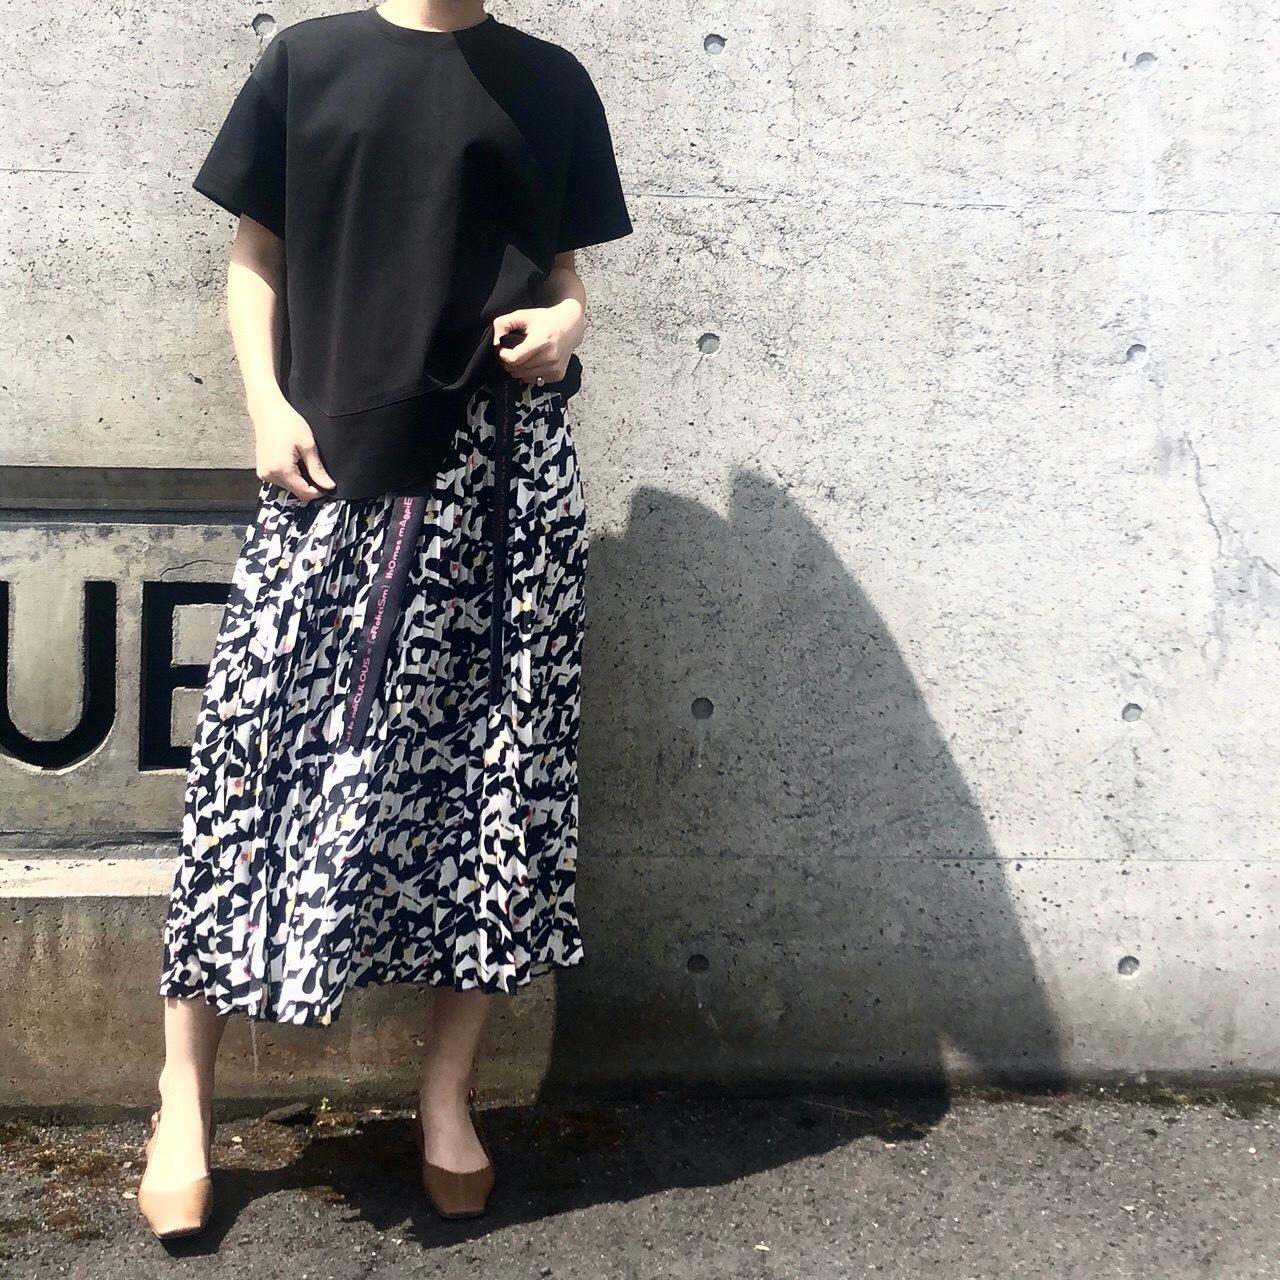 【 THOMAS MAGPIE 】- 2201609 - Pliated long skirt